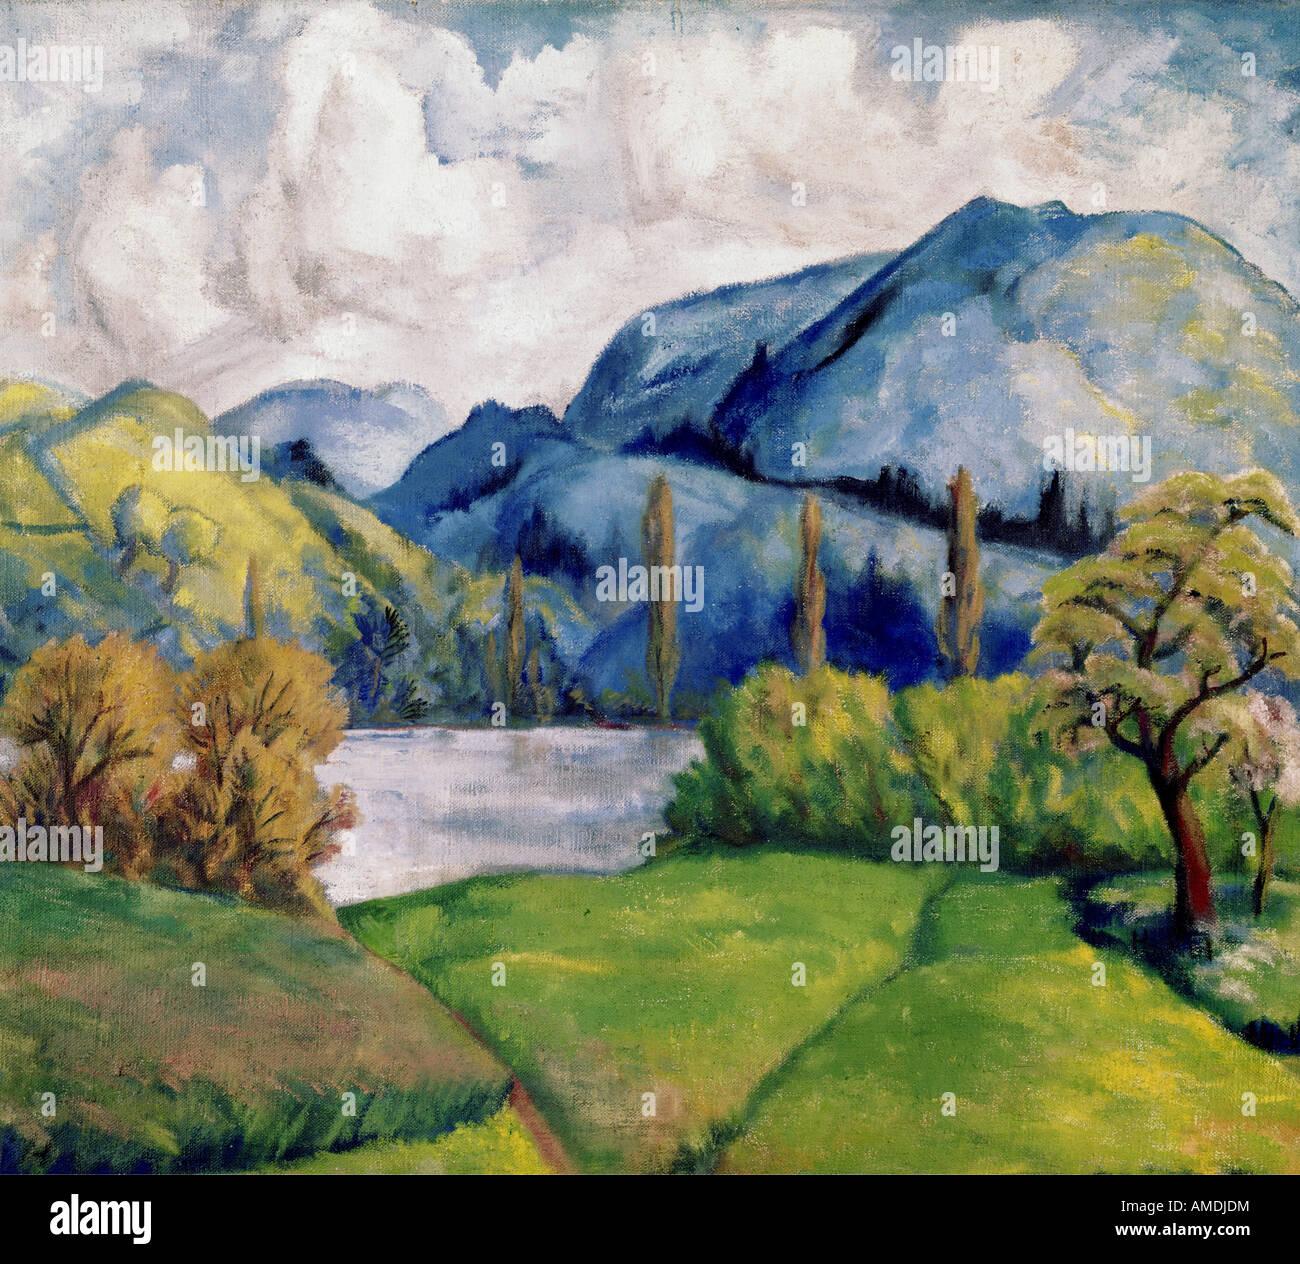 Bellas artes, Cezanne, Paul (1839 - 1906), la pintura, la Kunsthaus Zürich, Francés, impressionsm, naturaleza, Imagen De Stock